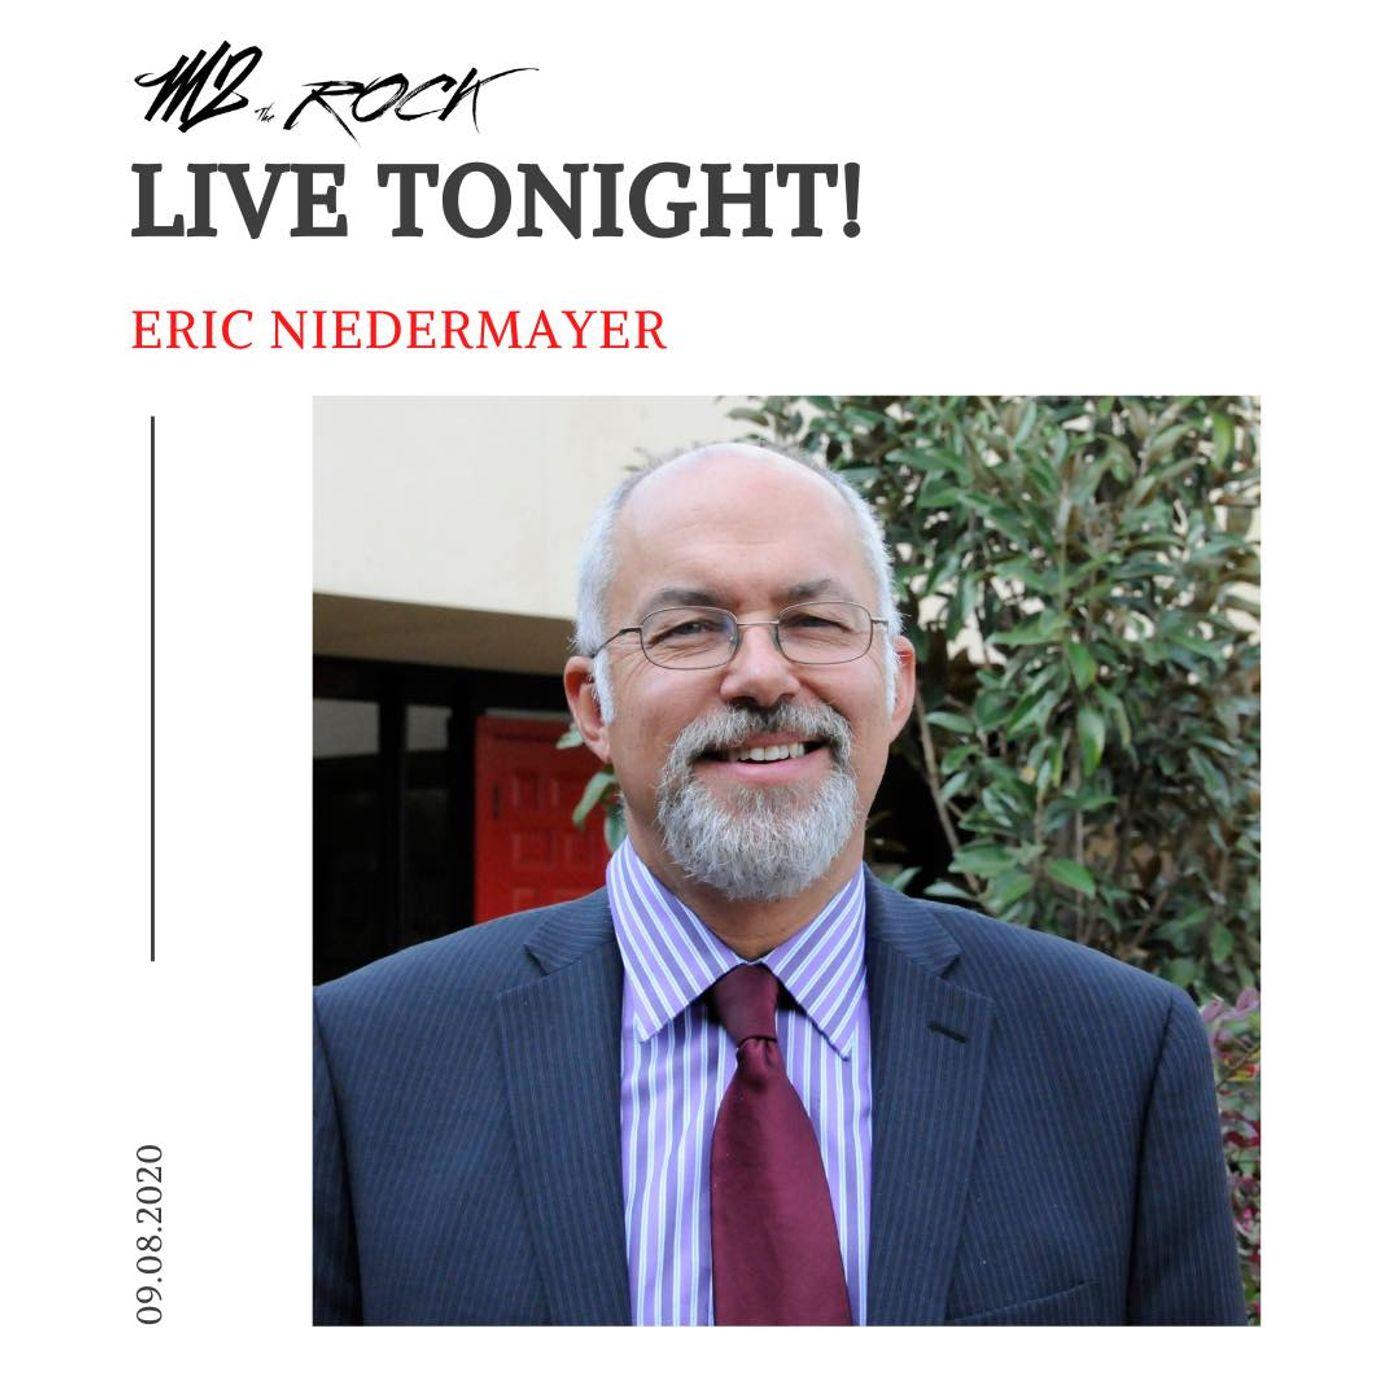 Eric Niedermayer LIVE on M2 the Rock